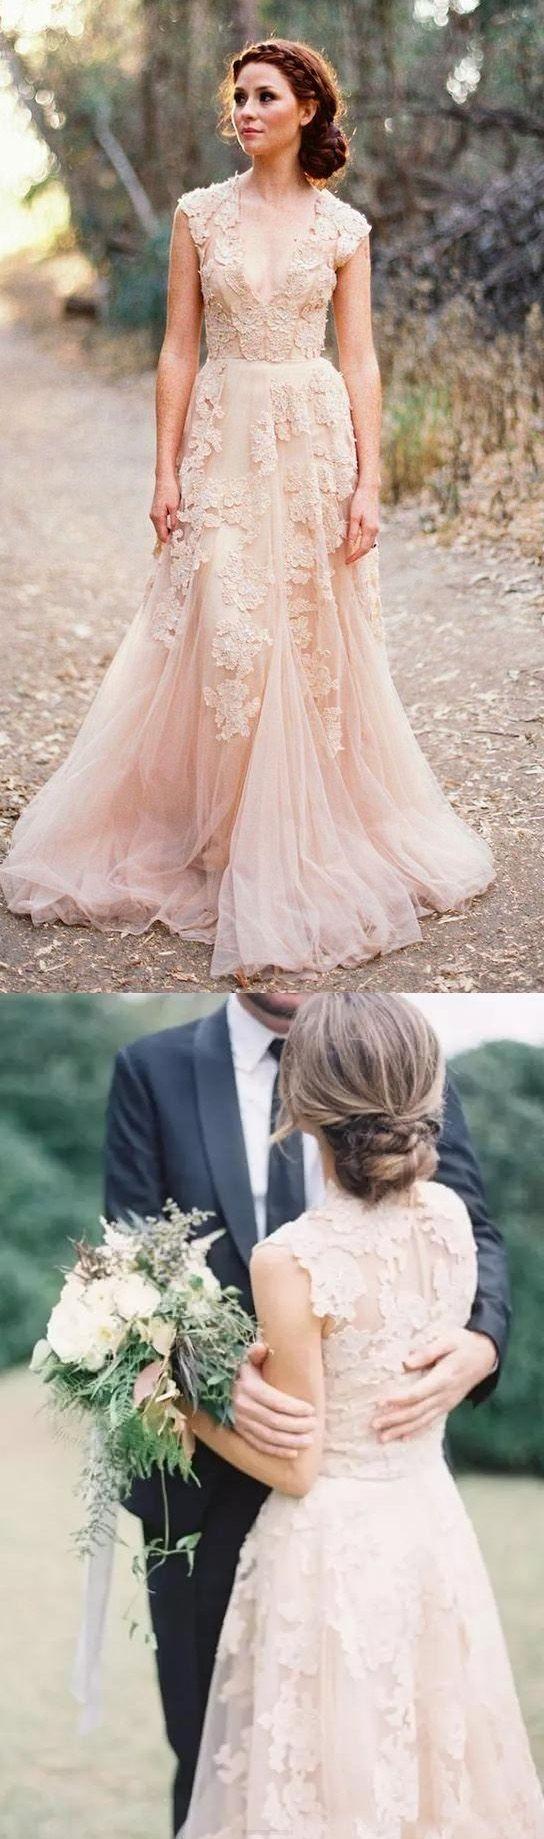 best wedding dresses images on pinterest dress wedding